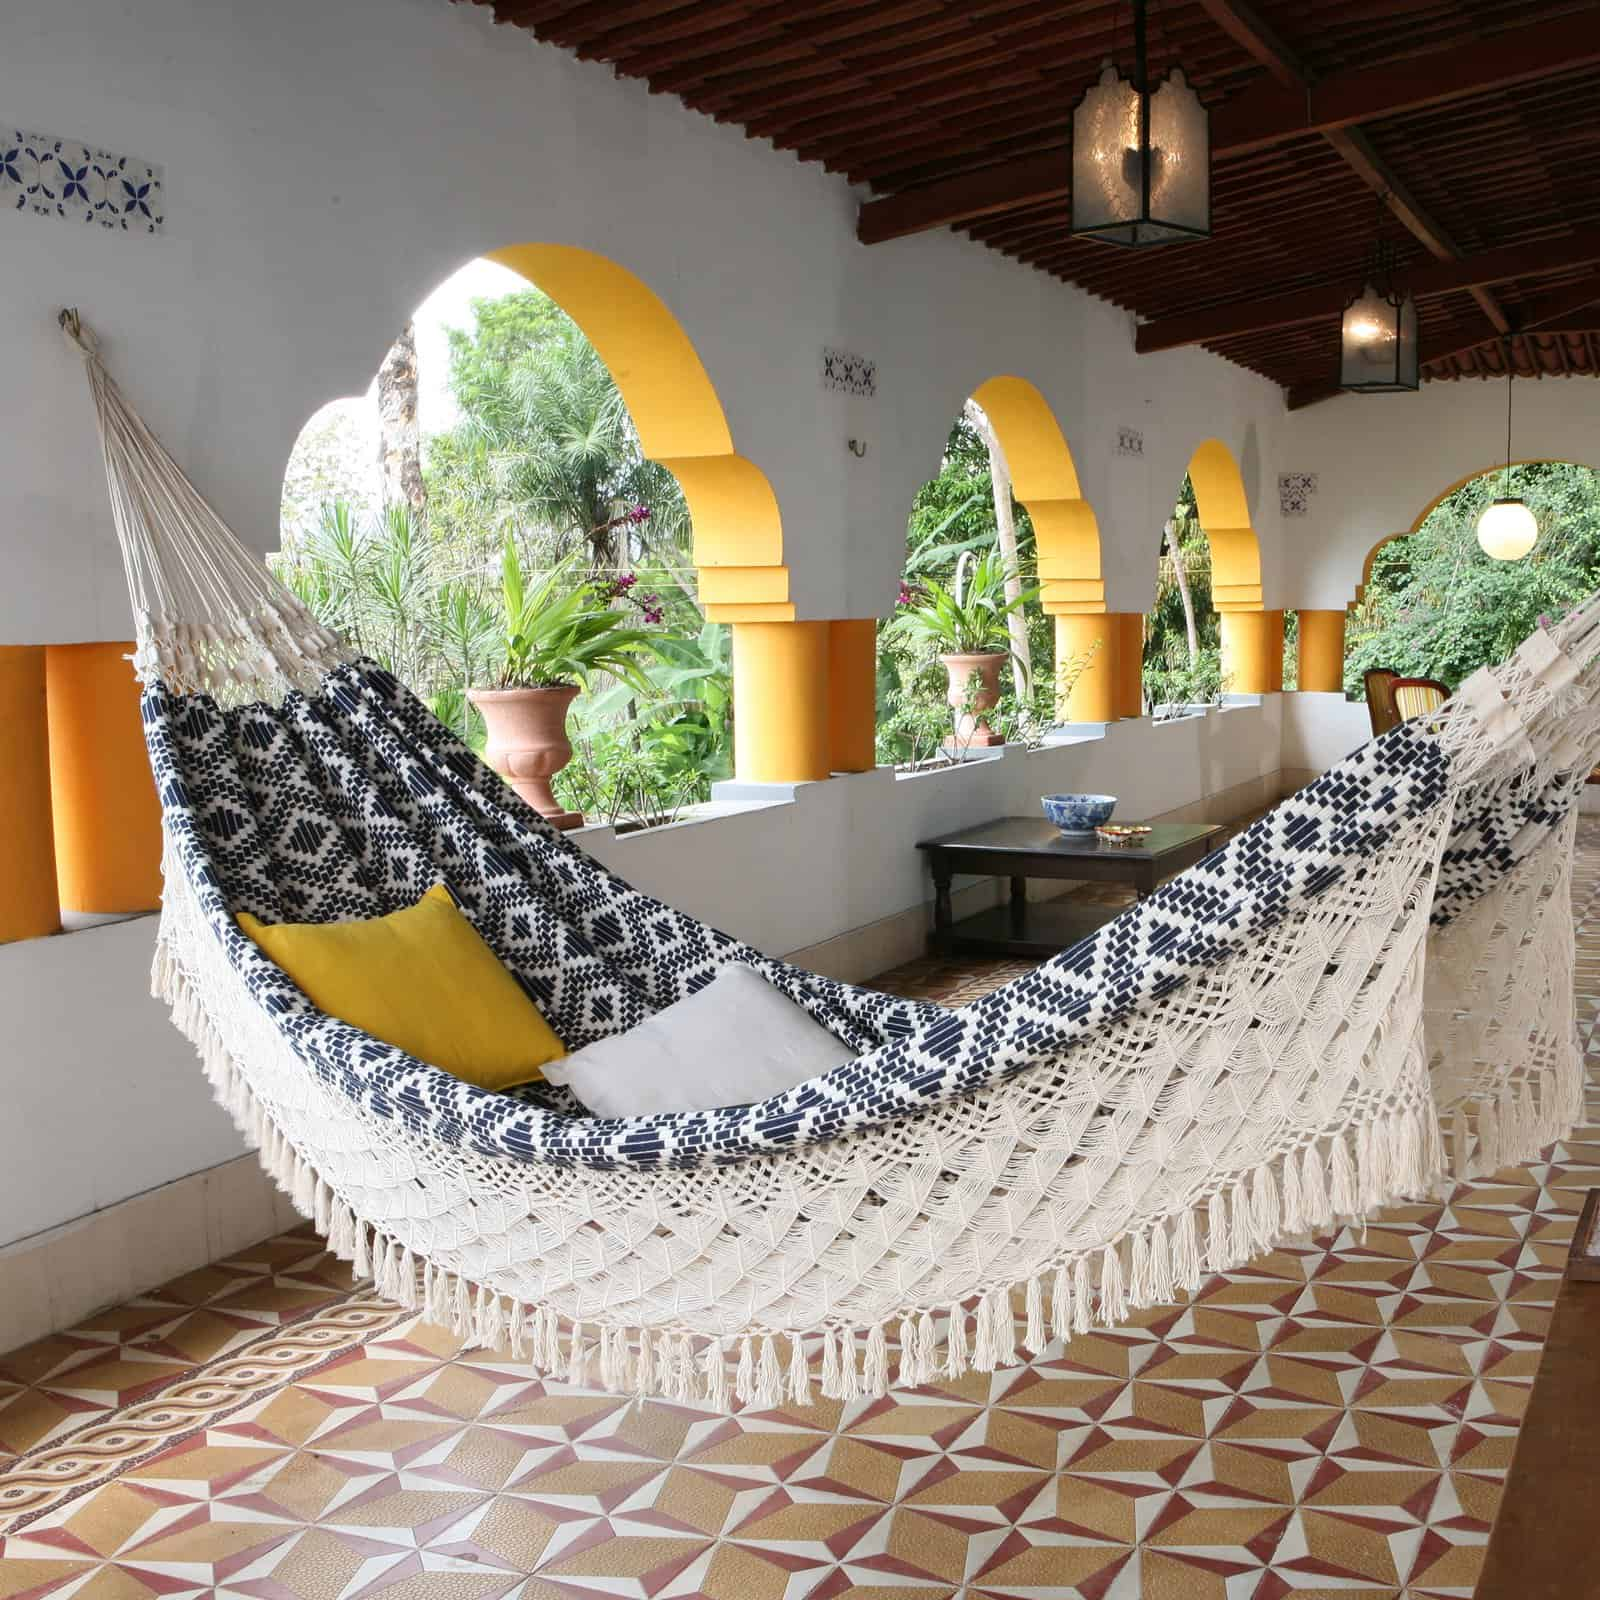 brazillian XL indoor hammock